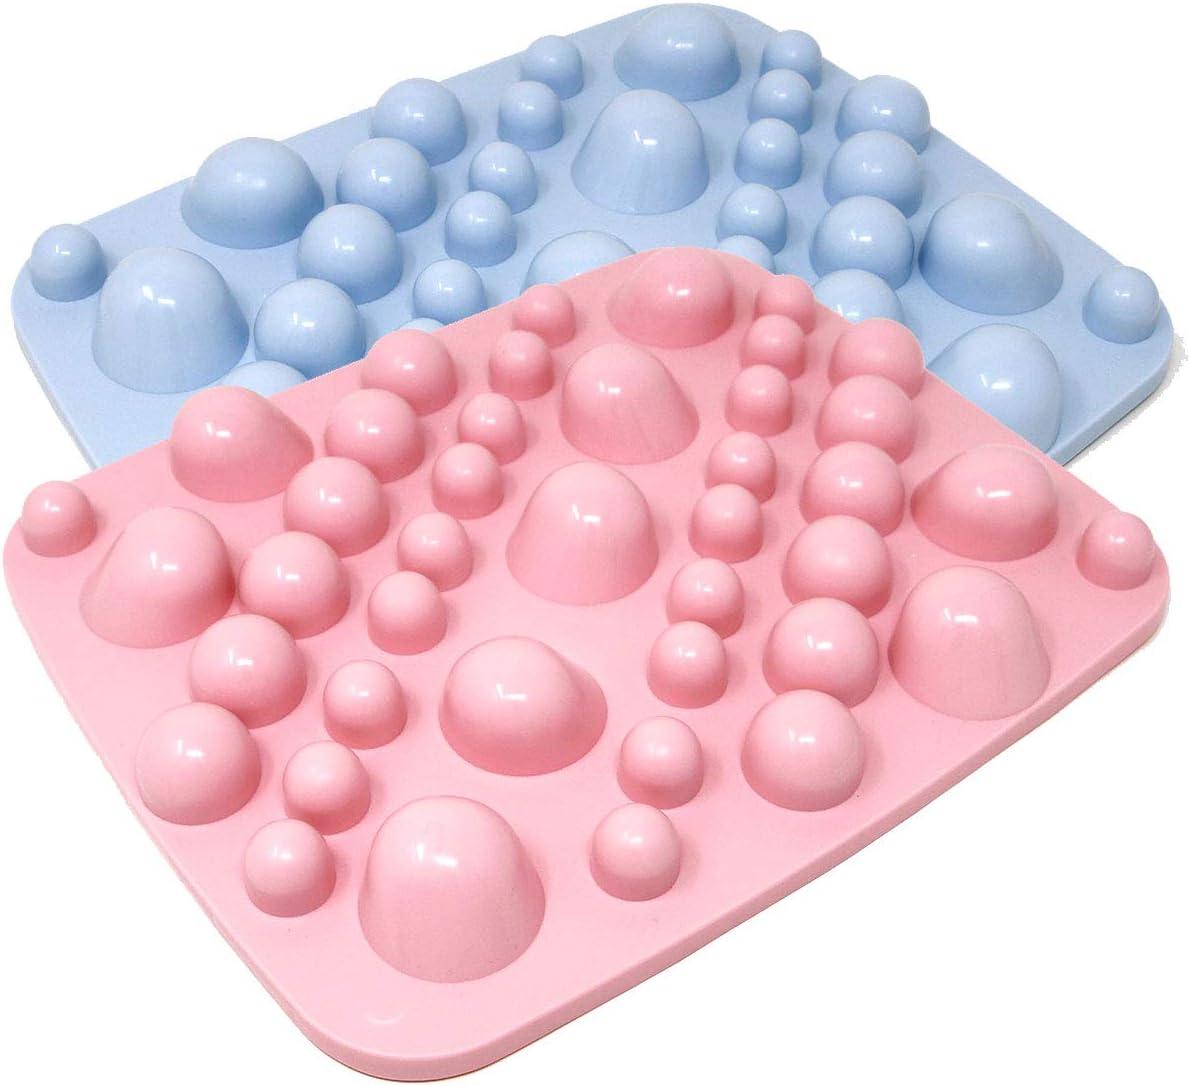 Foot Massage Mat Accupressure Mats, Feet Massager Massage Pad, Therapy Foot Massager Plantar Fasciitis, Made in Japan, Round Stone Pink